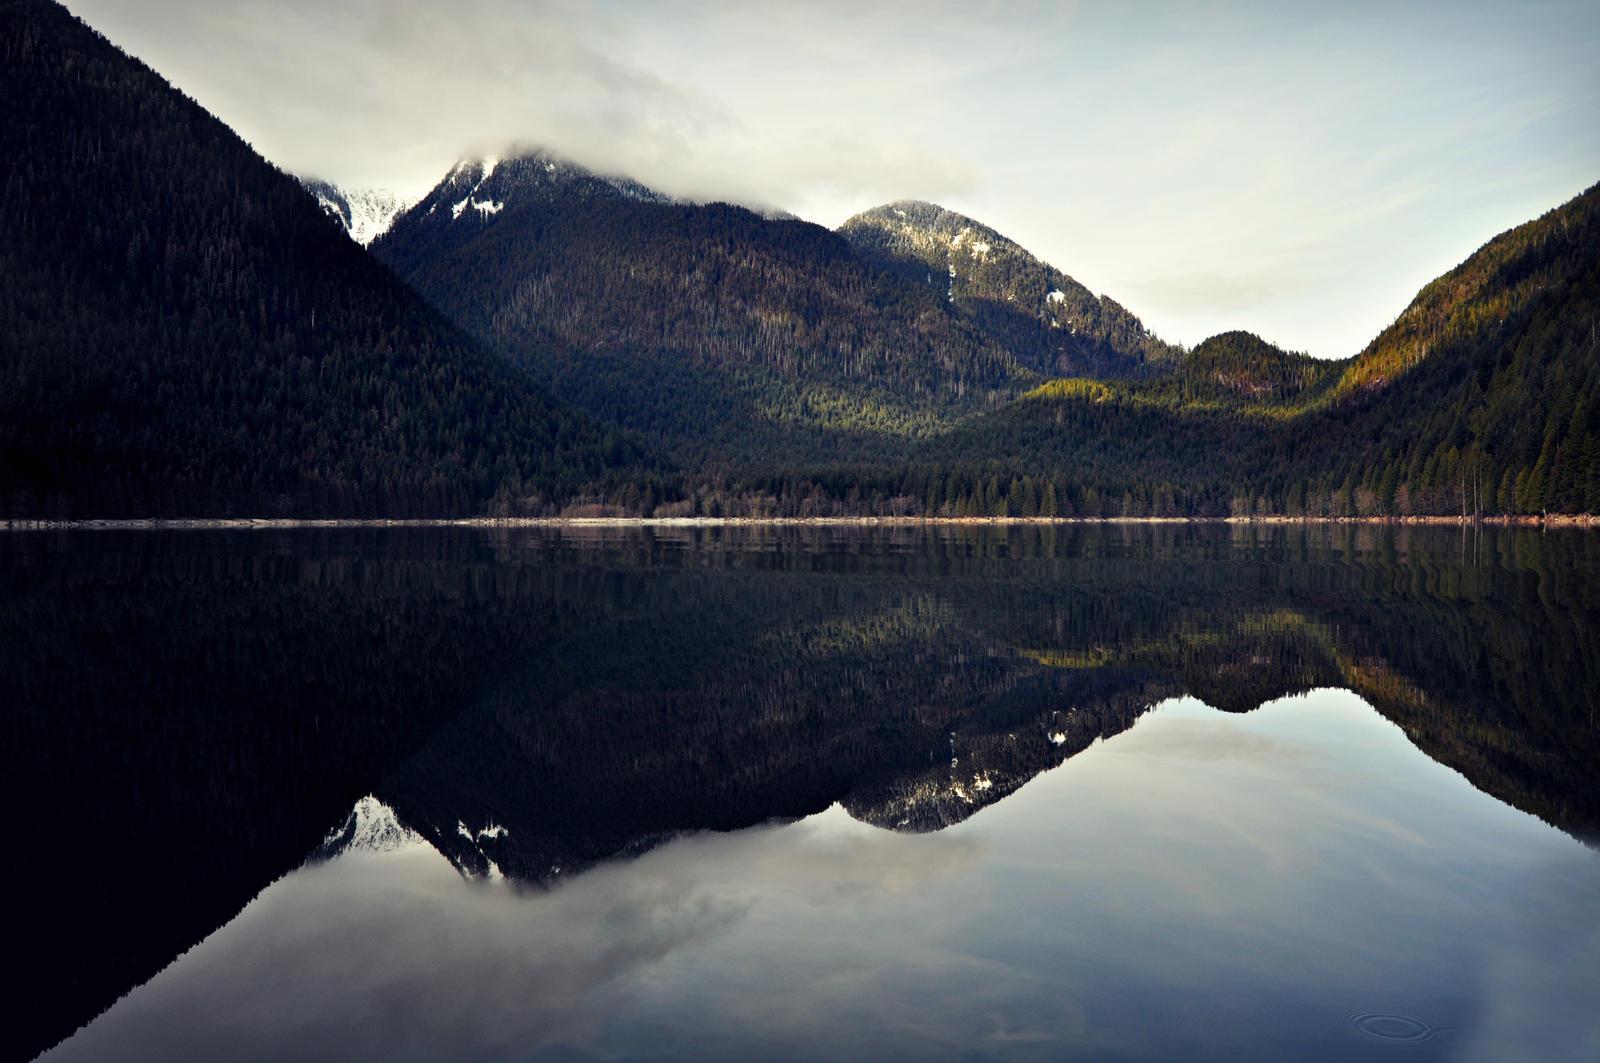 Alouette Lake Water Reflection by angela-swift